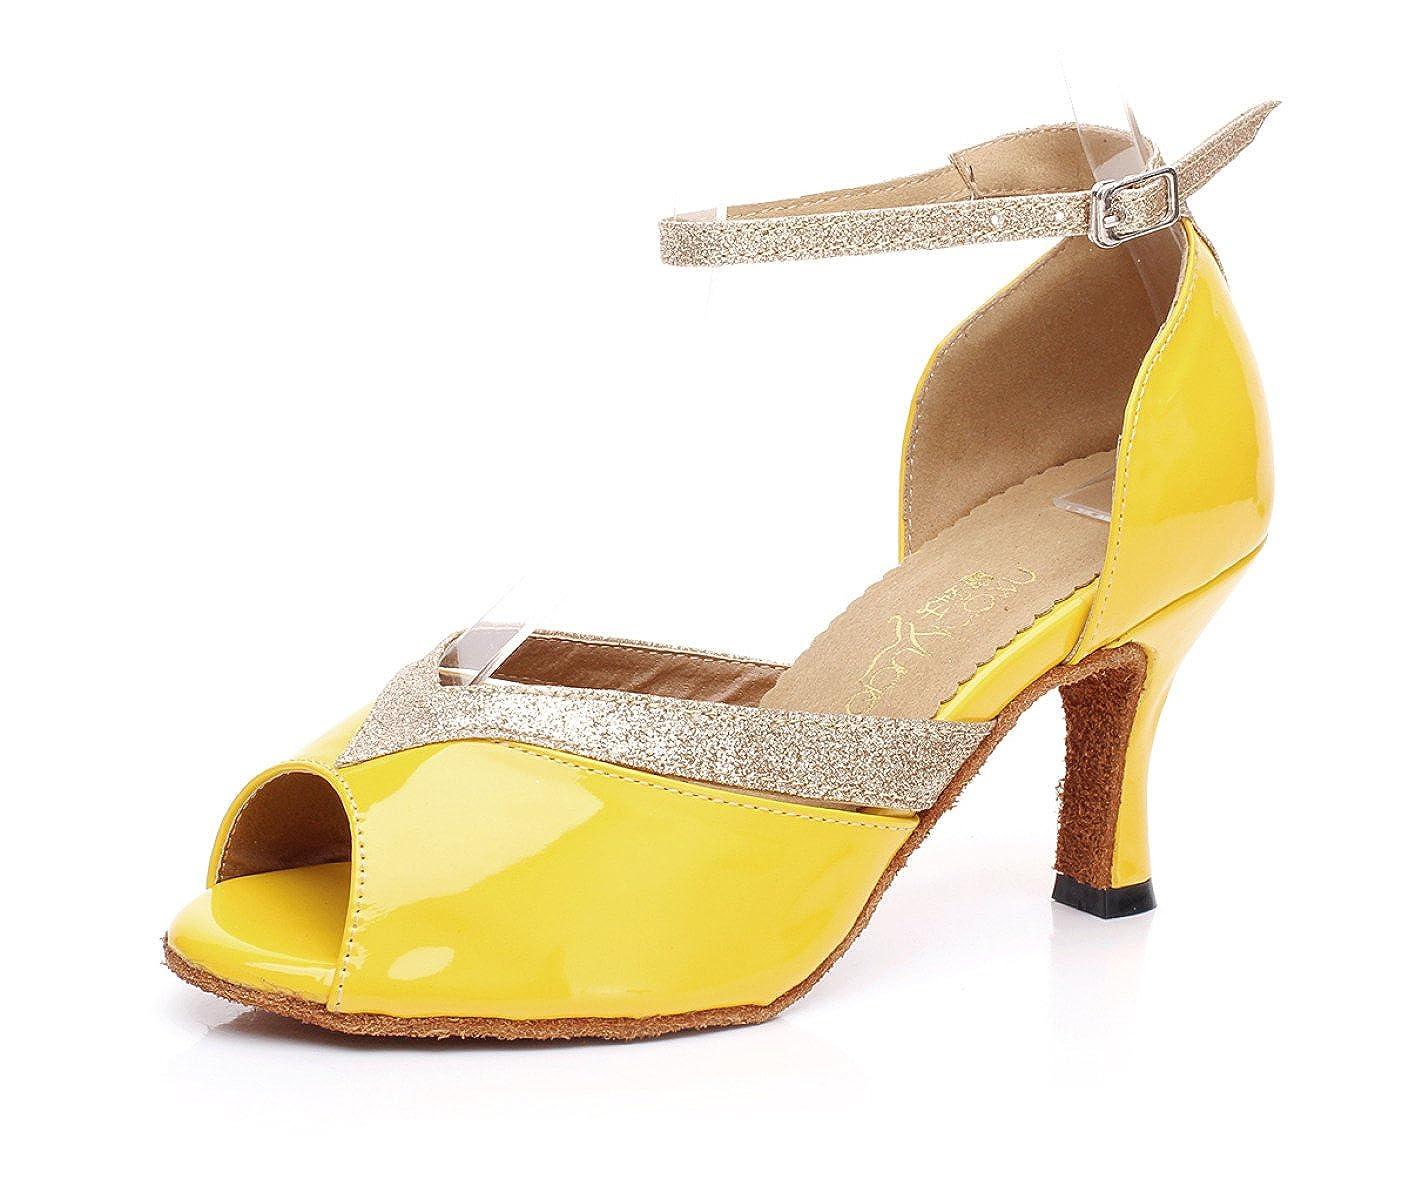 JSHOE Chaussures De Danse Salsa De Latin PU PU Salsa 2694 PU/Tango/Thé/Samba/Moderne/Jazz Sandales Chaussures Talons Hauts,Yellow-heeled7.5cm-UK4/EU35/Our36 - 721bcb2 - piero.space